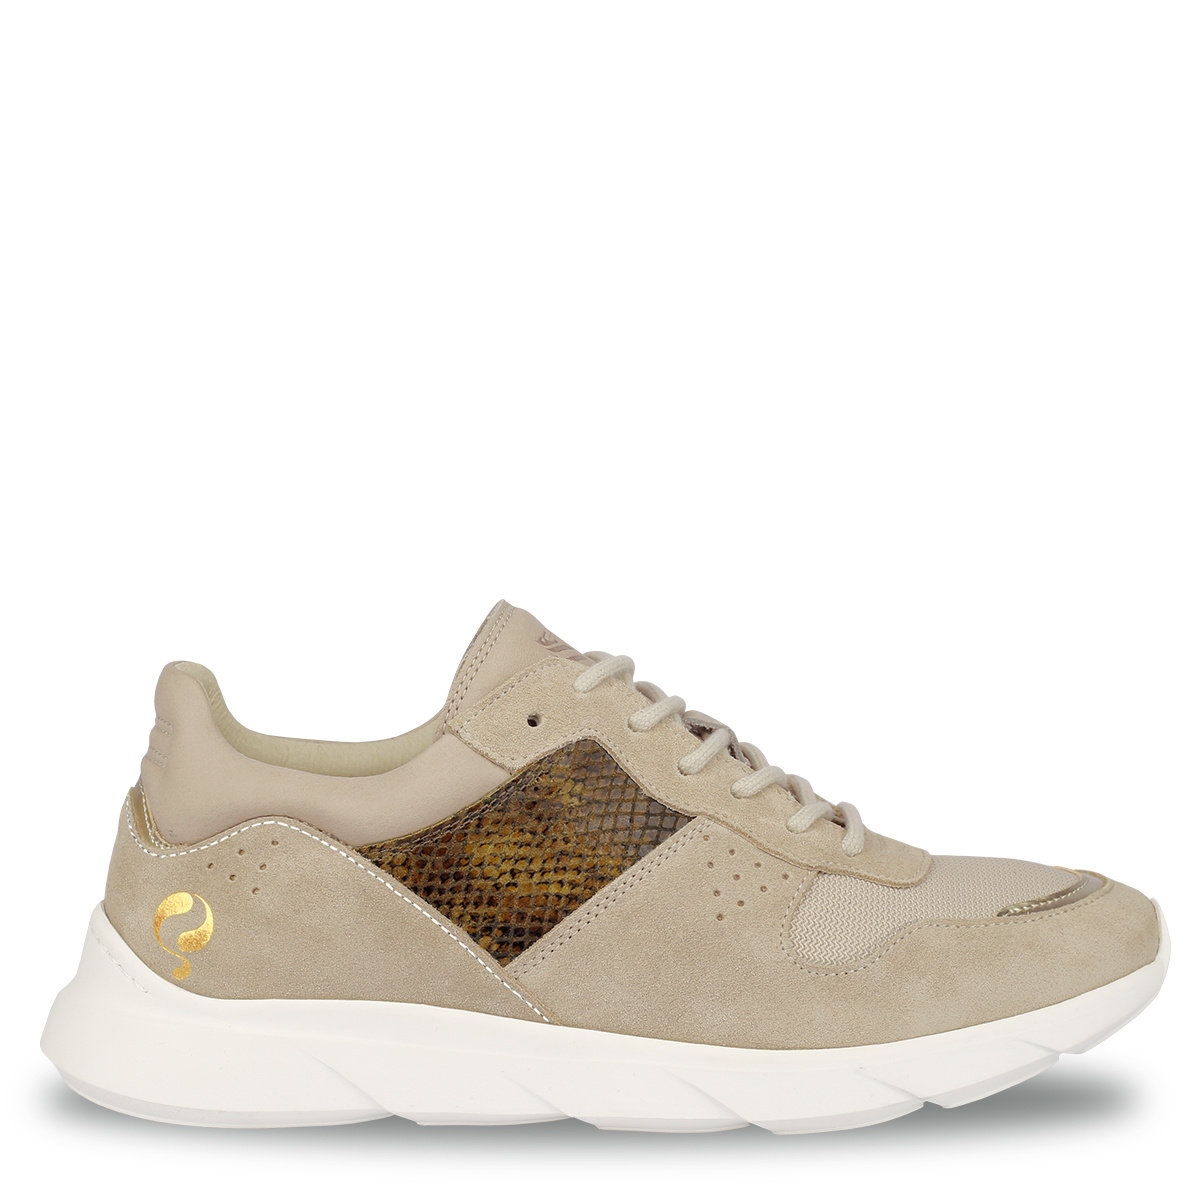 Dames Sneaker Hillegom Zacht taupe